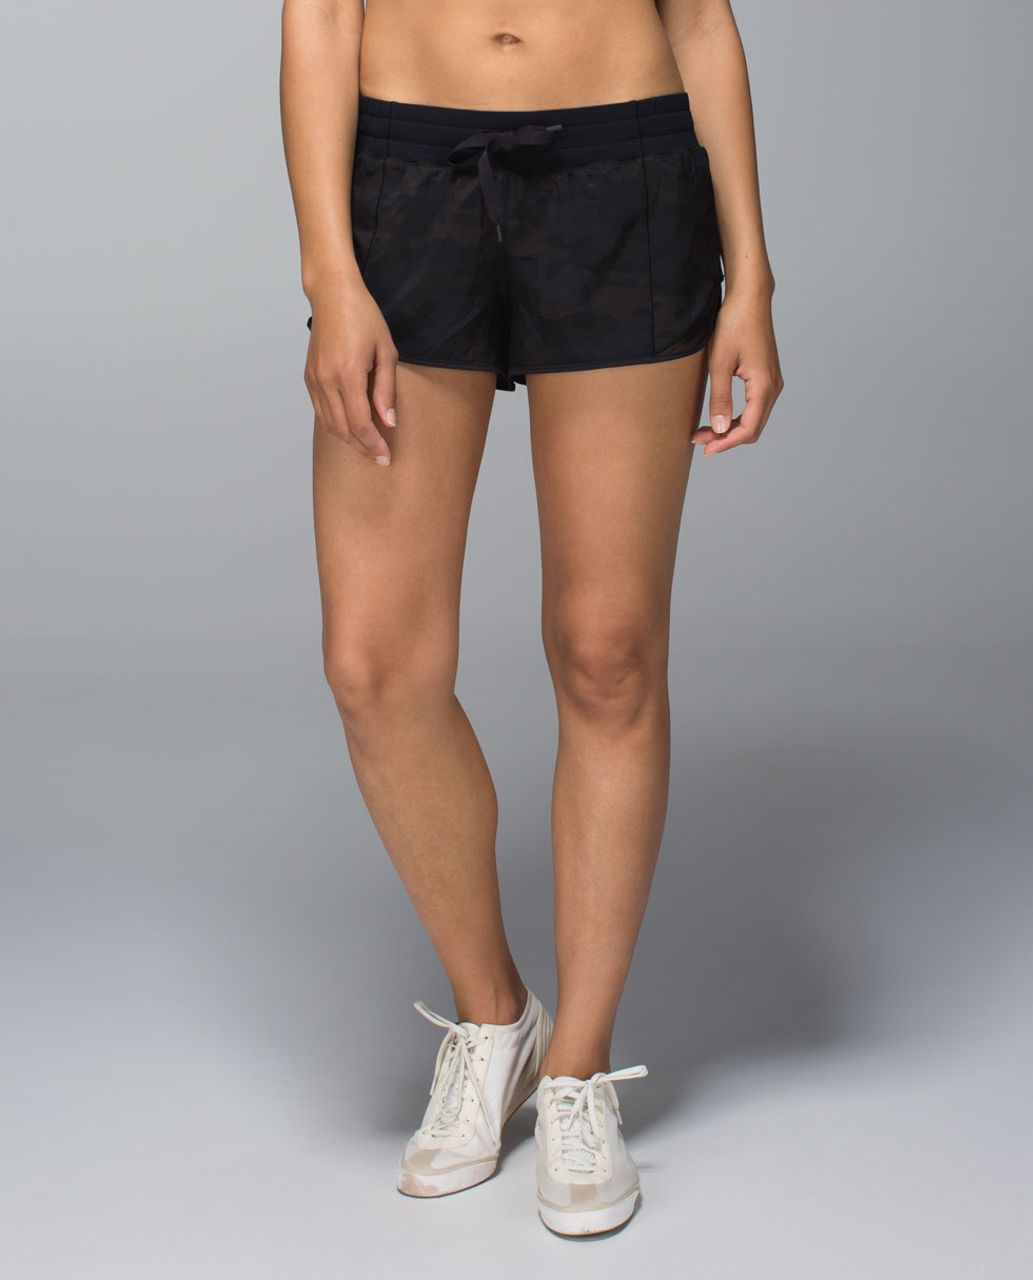 Lululemon Hotty Hot Short - Savasana Camo 20cm New Black / Black